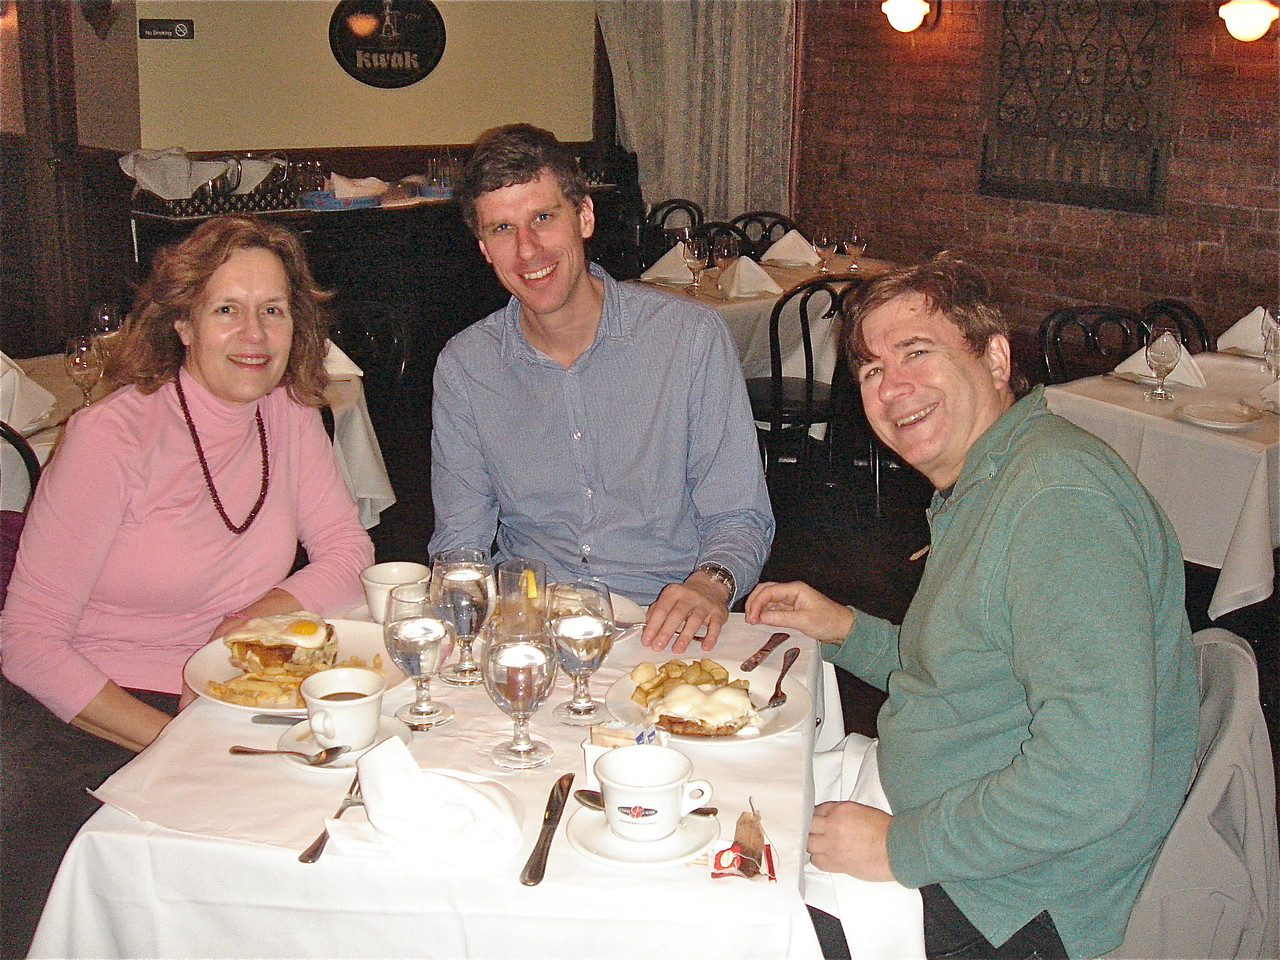 Lorraine, Patrick, and John Wagner